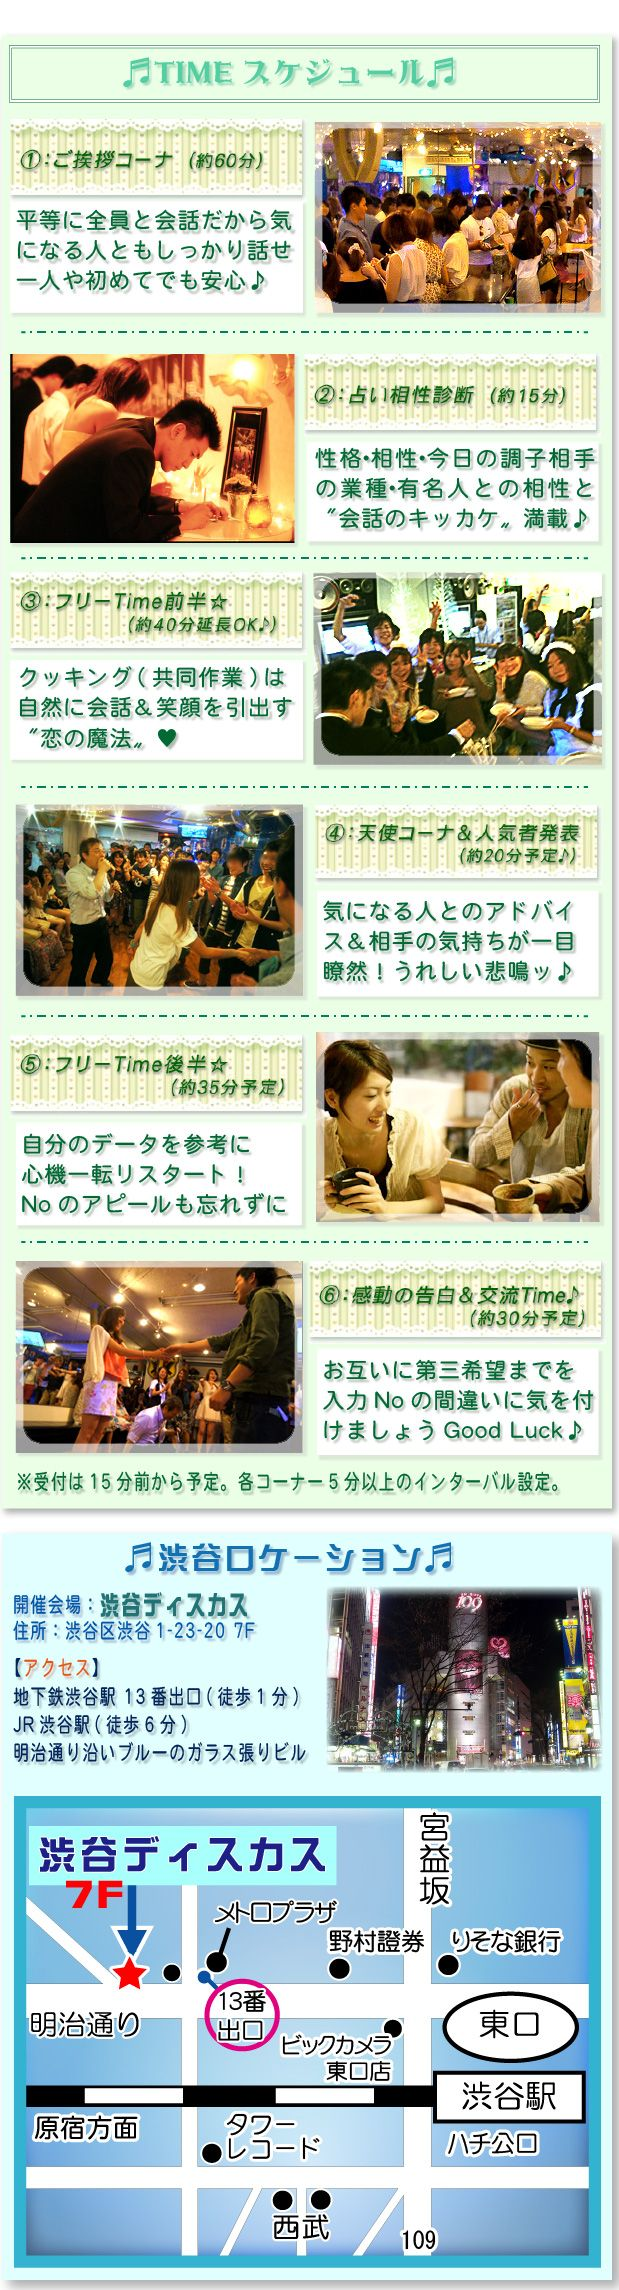 渋谷 TIME